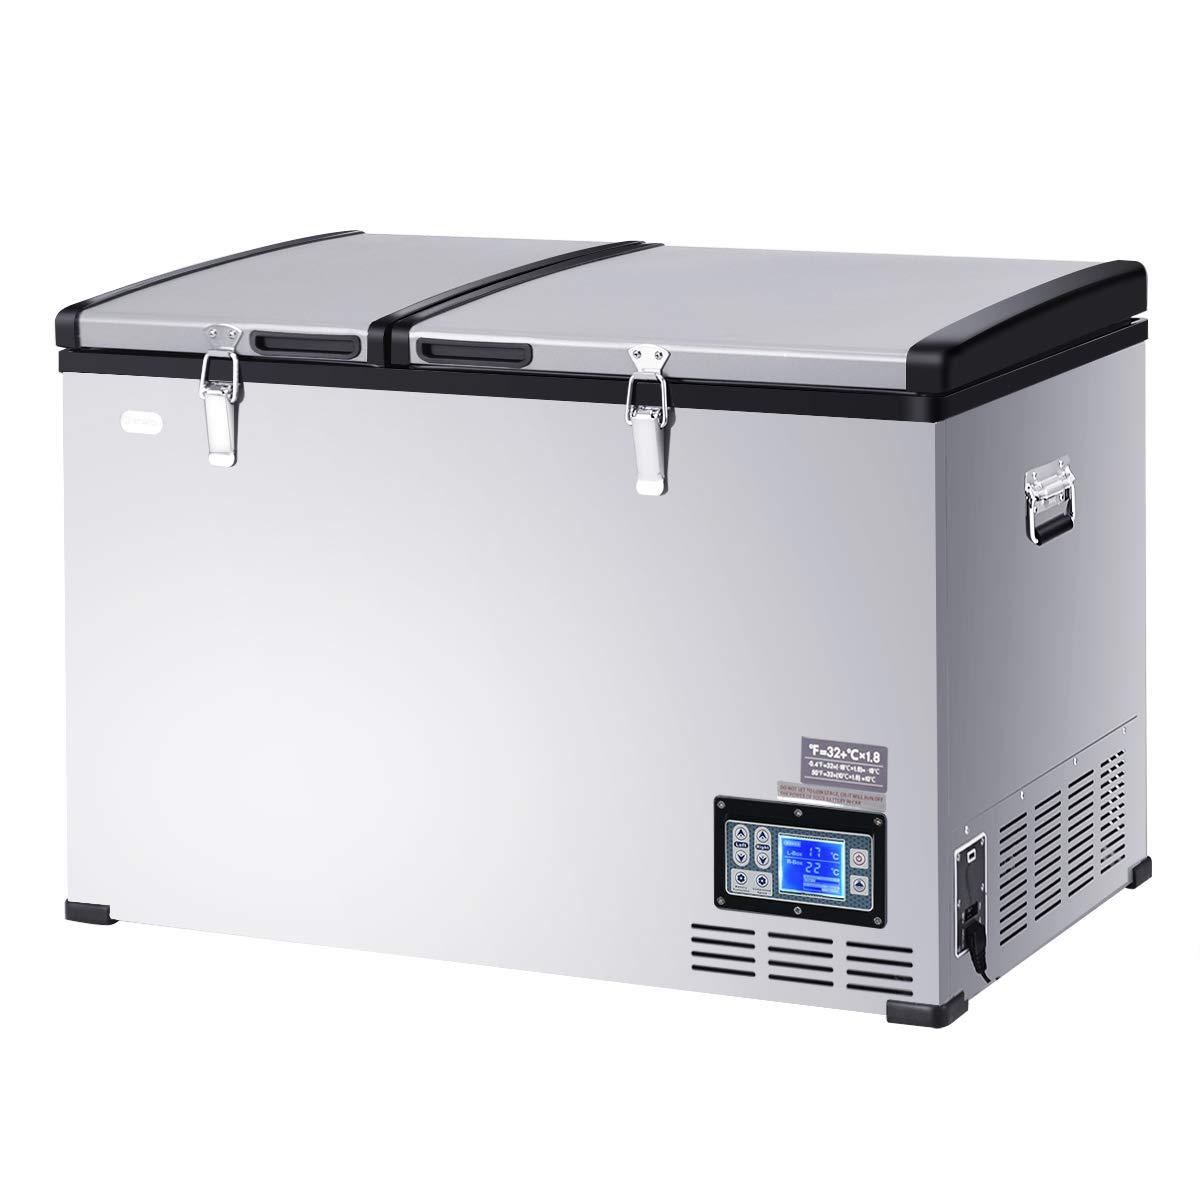 COSTWAY Compact Car Travel Refrigerator Freezer Portable Compressor Mini Fridge For Car and Home, Camping, Truck Party, Travel, Picnic Outdoor (105 Quart)